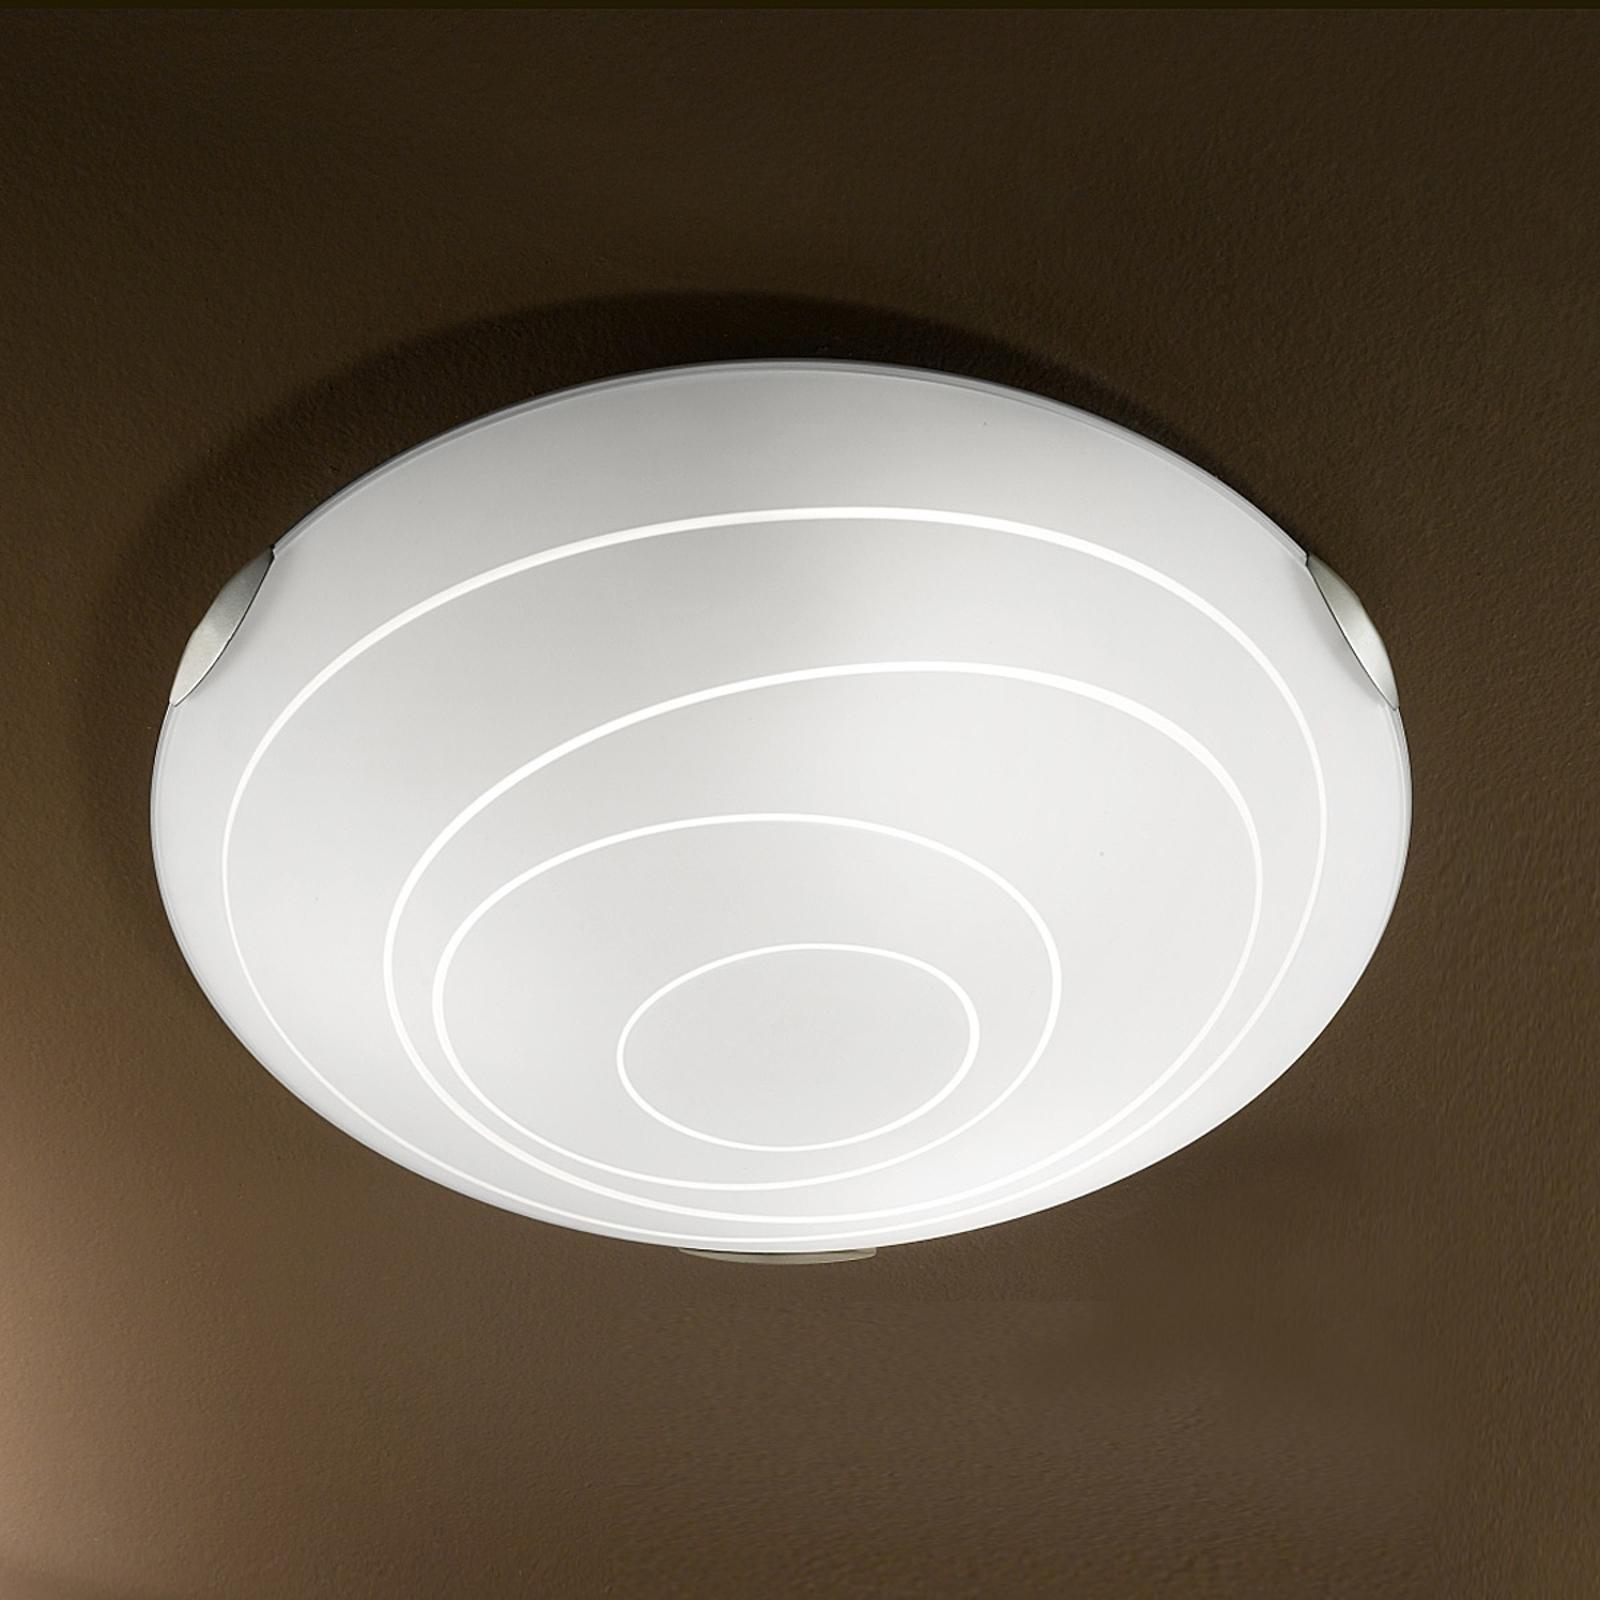 Ronde plafondlamp KENT, wit